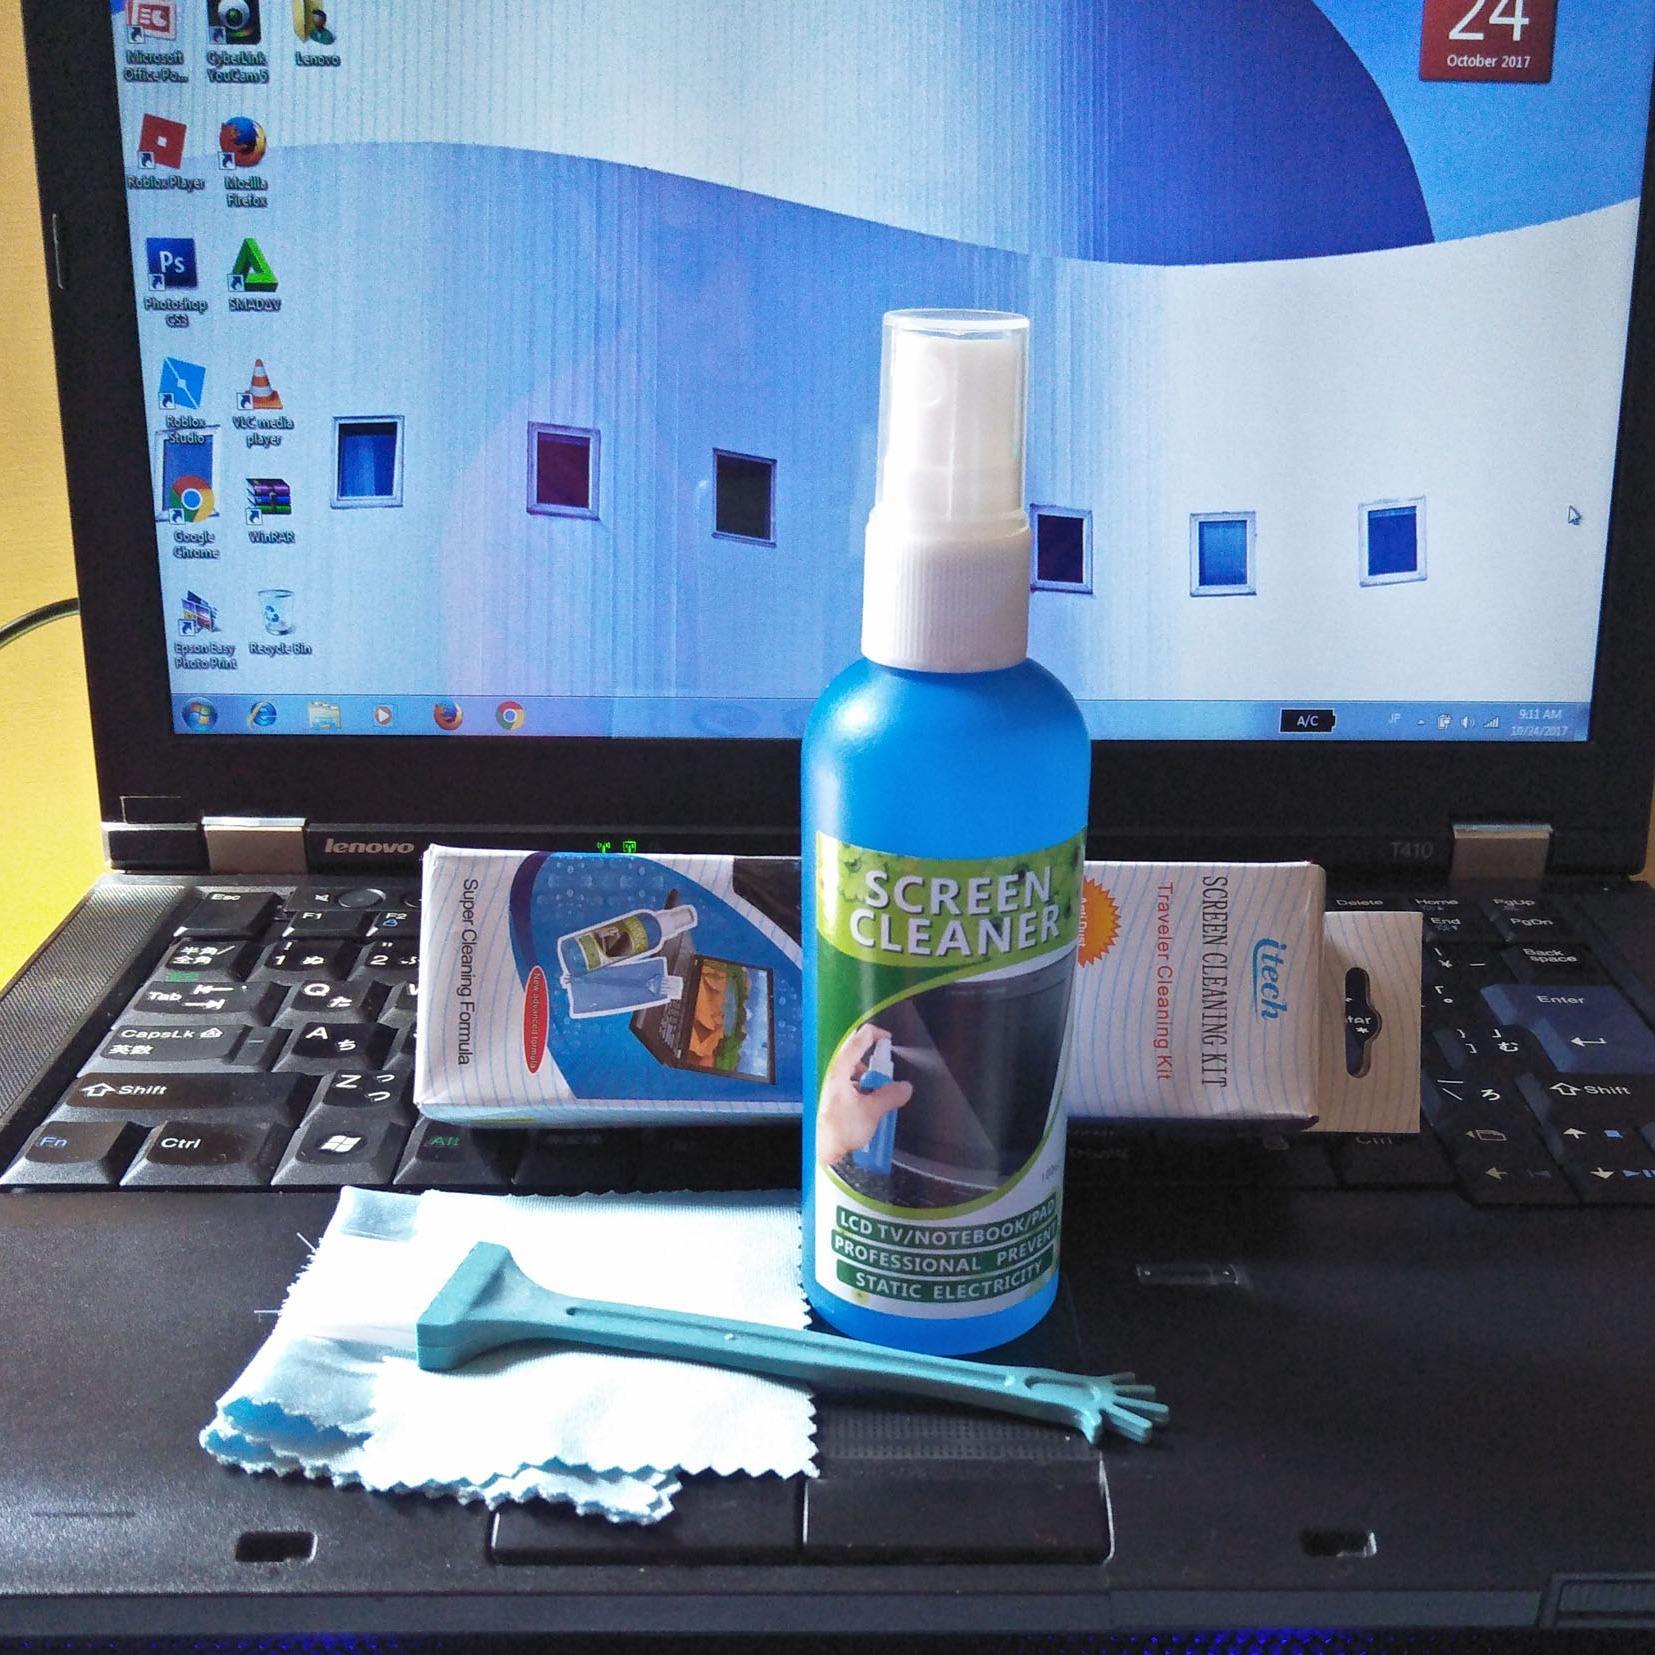 Screen Cleaning 3 In 1 / Pembersih Layar LCD